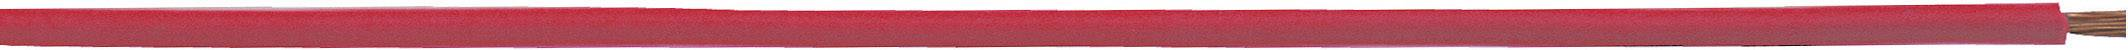 Opletenie / lanko LappKabel 4510051 H05V-K, 1 x 0.50 mm², vonkajší Ø 2.10 mm, 100 m, biela